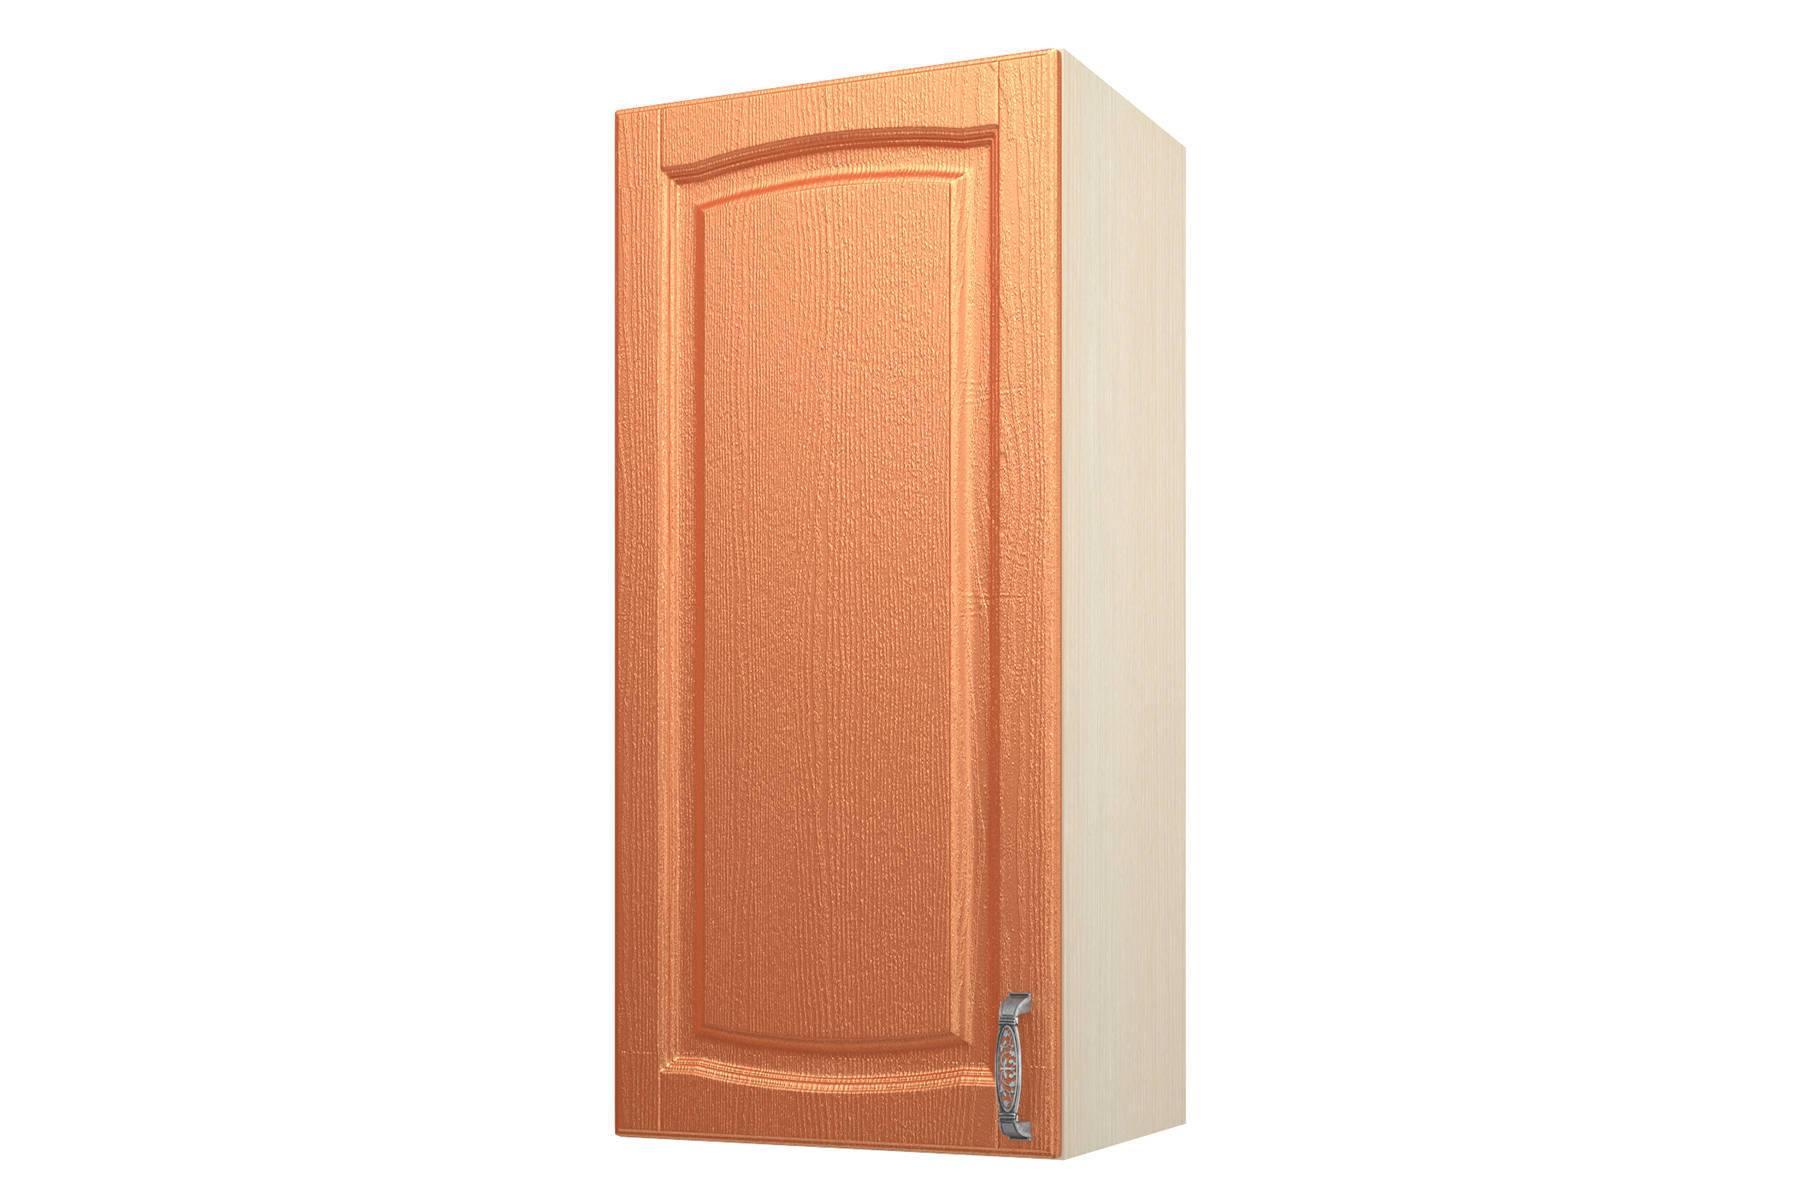 Равенна ART Шкаф навесной 45, (Н-96), 1 дверь равенна art шкаф навесной 40 н 96 1 дверь